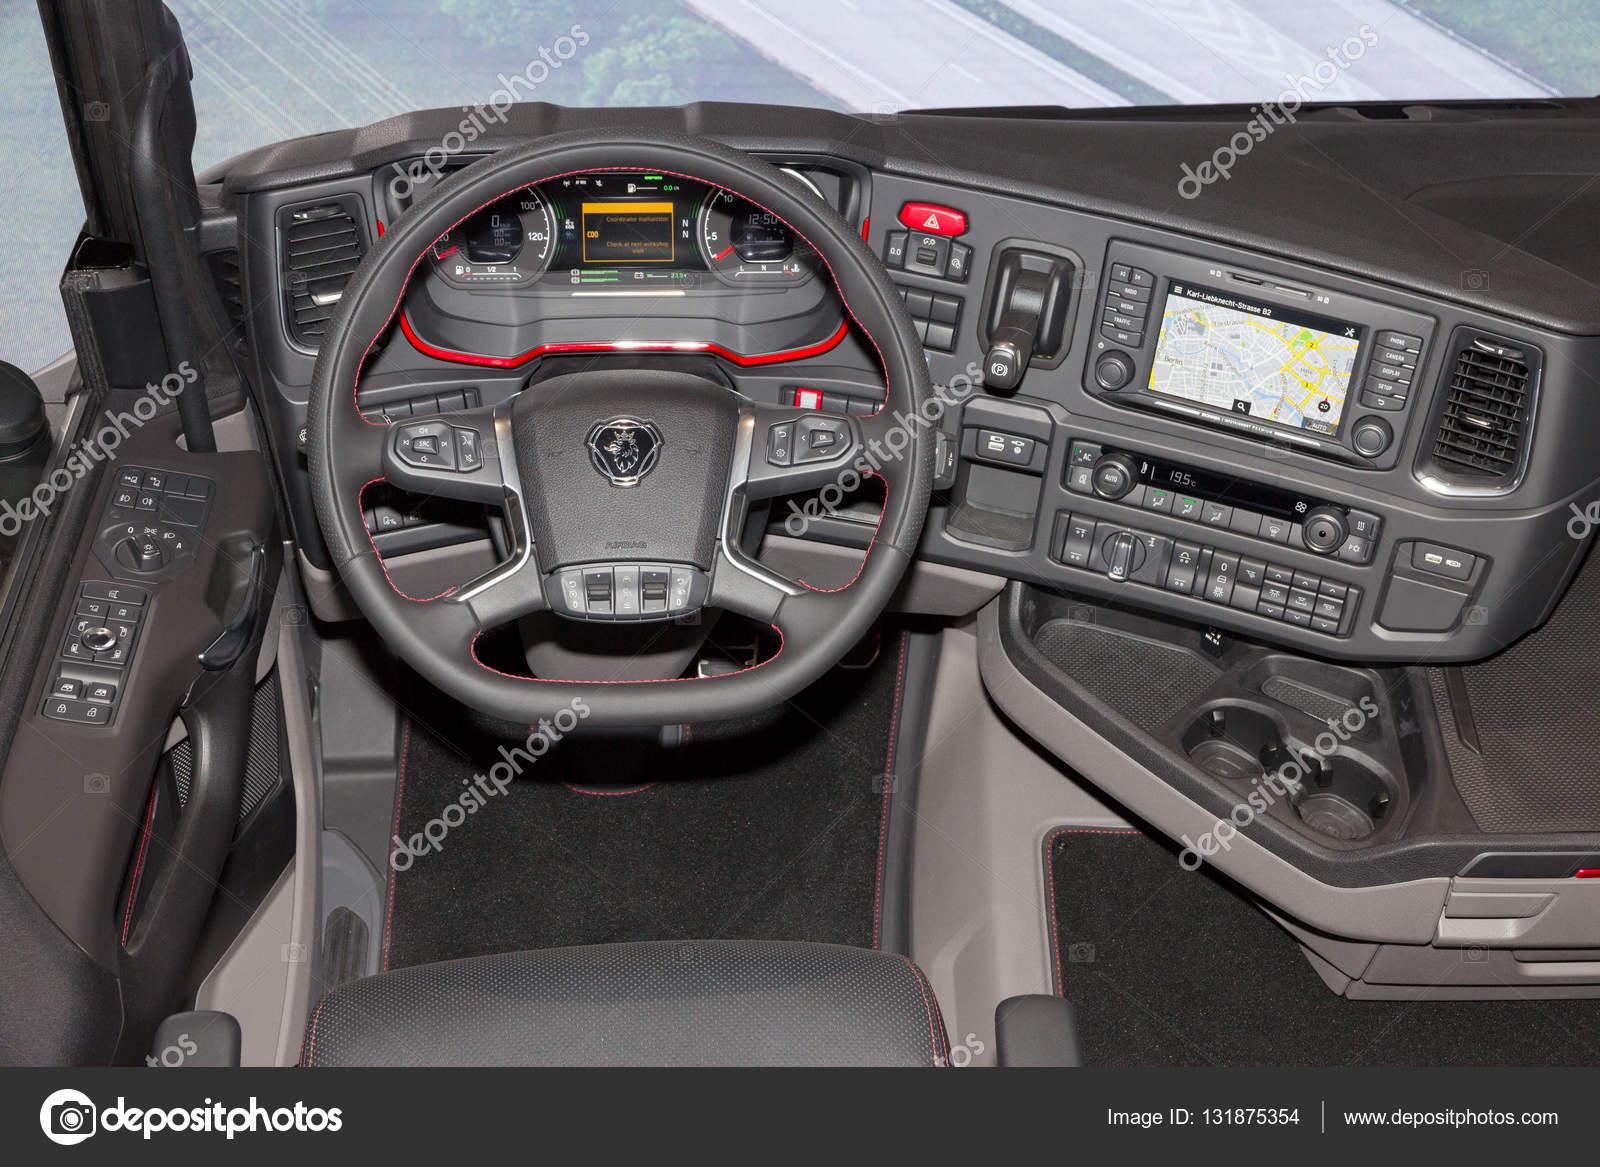 https://st3.depositphotos.com/1671840/13187/i/1600/depositphotos_131875354-stock-photo-scania-truck-interior.jpg